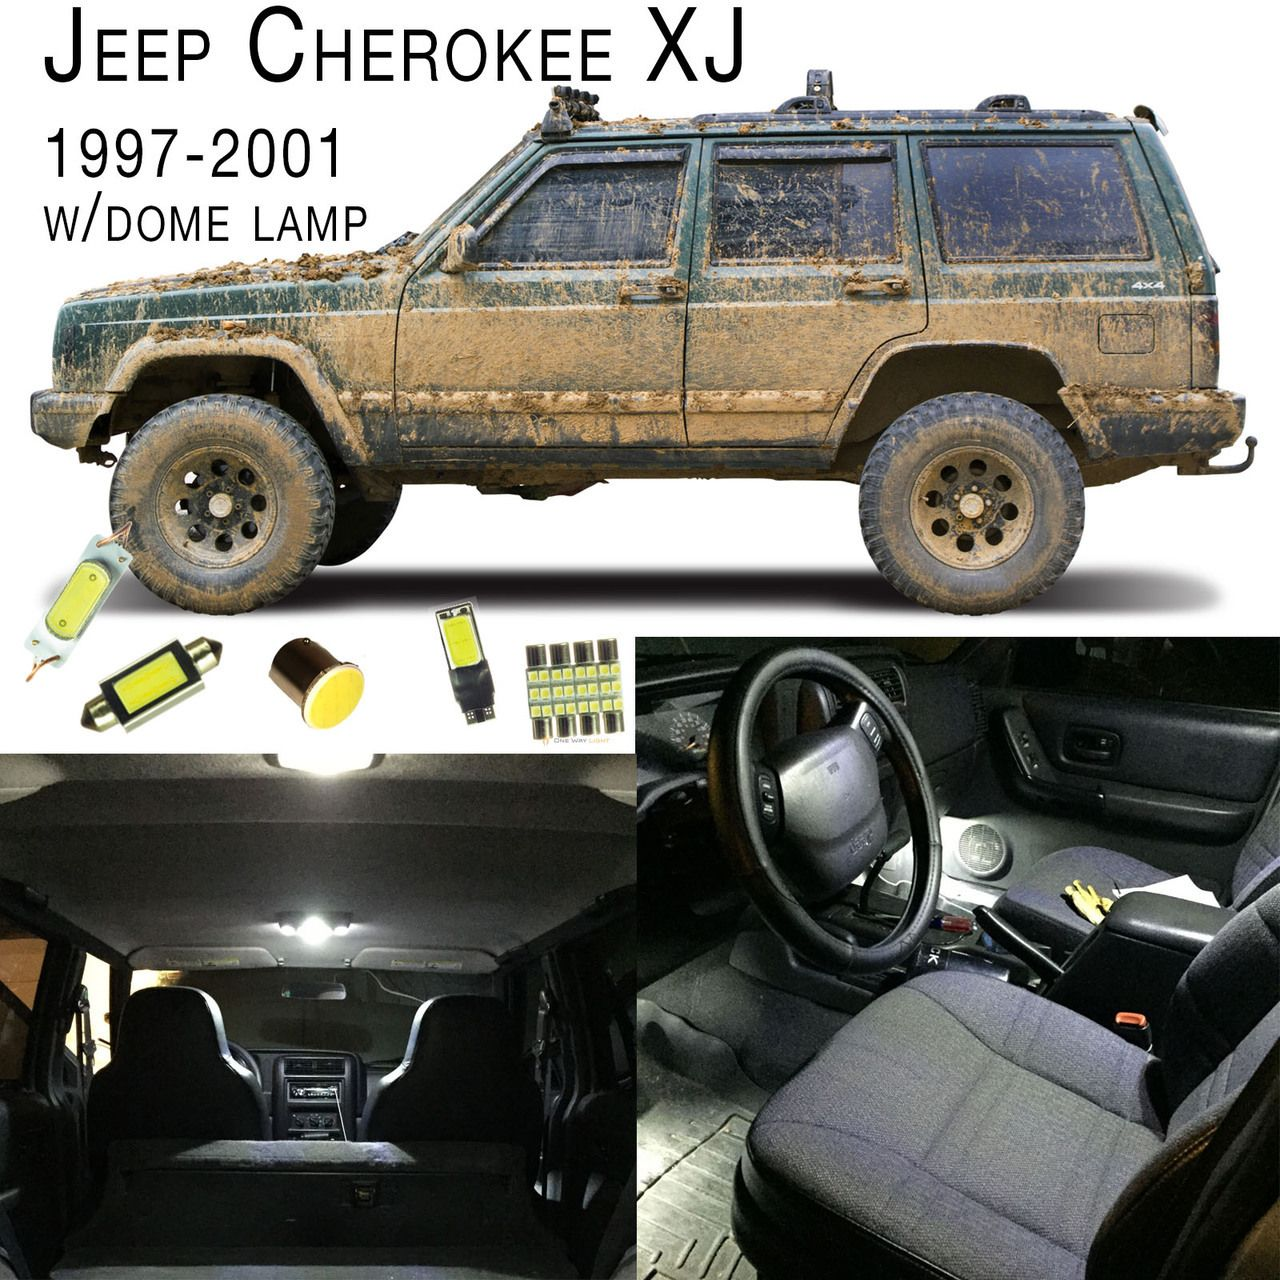 Image 1 Jeep Cherokee Xj Jeep Cherokee 2001 Jeep Cherokee